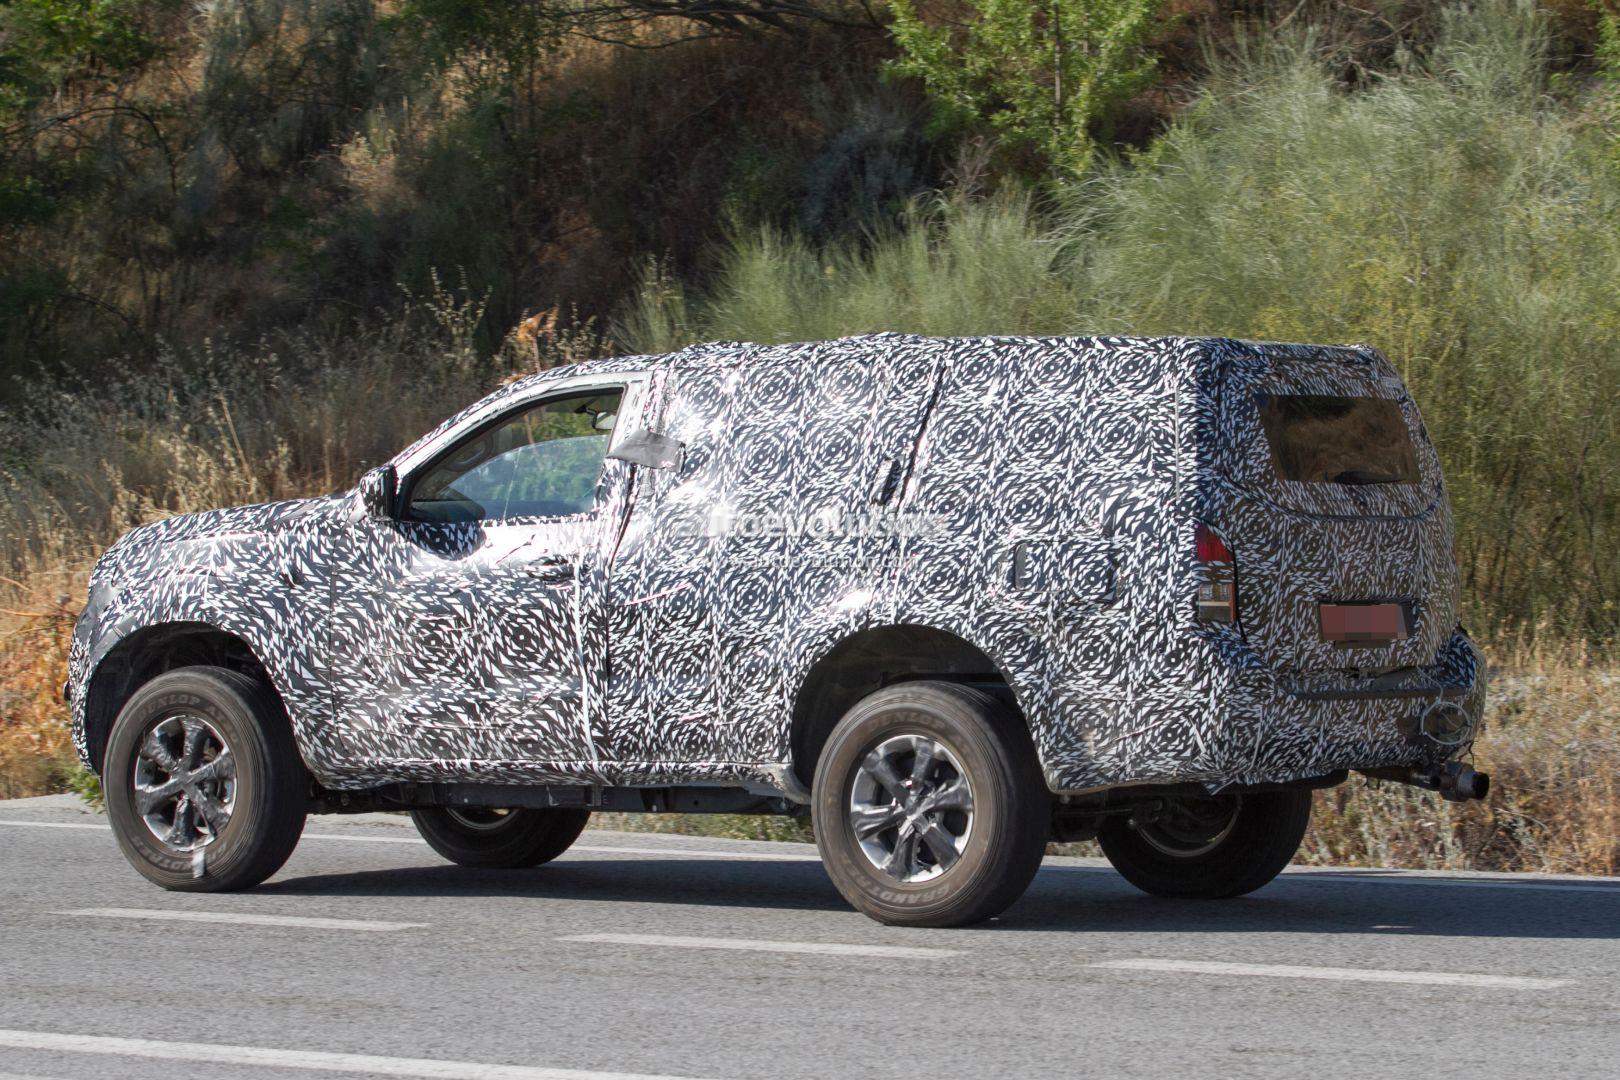 Nissan Pathfinder 2019 >> 2019 Nissan Pathfinder Review Hybrid Changes Redesign